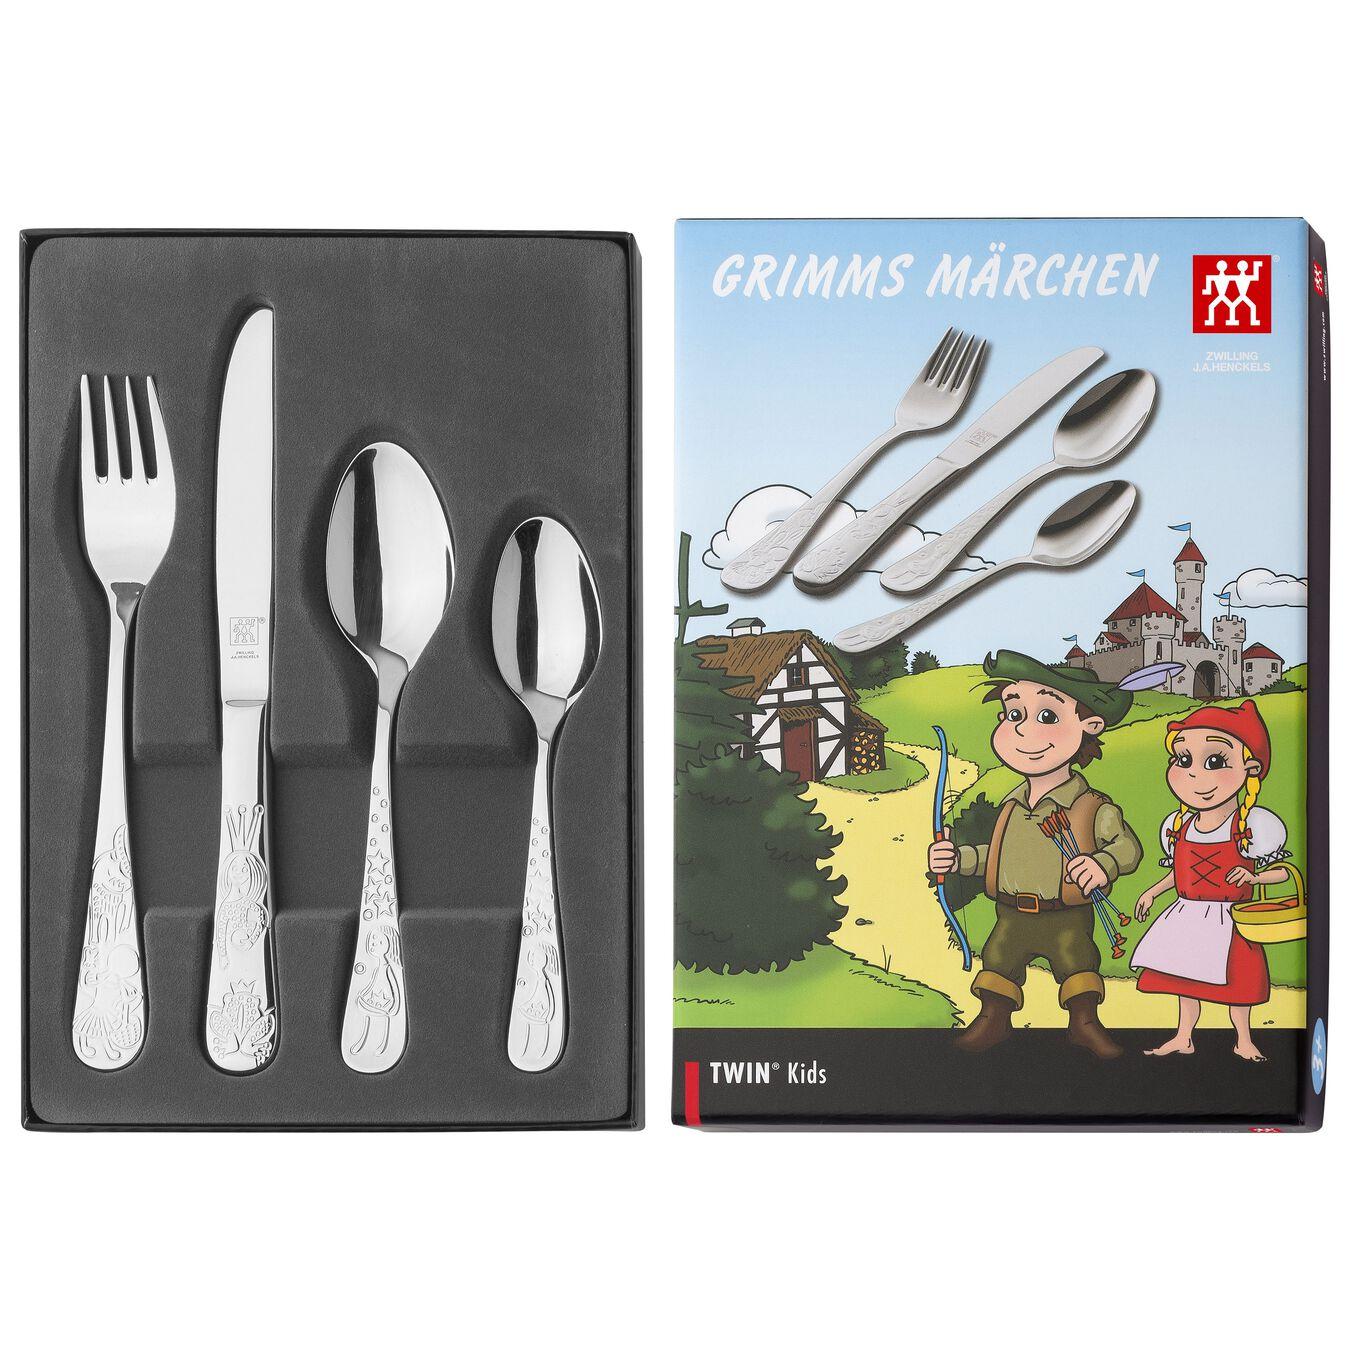 4-pc Children's flatware set, special formula steel ,,large 6